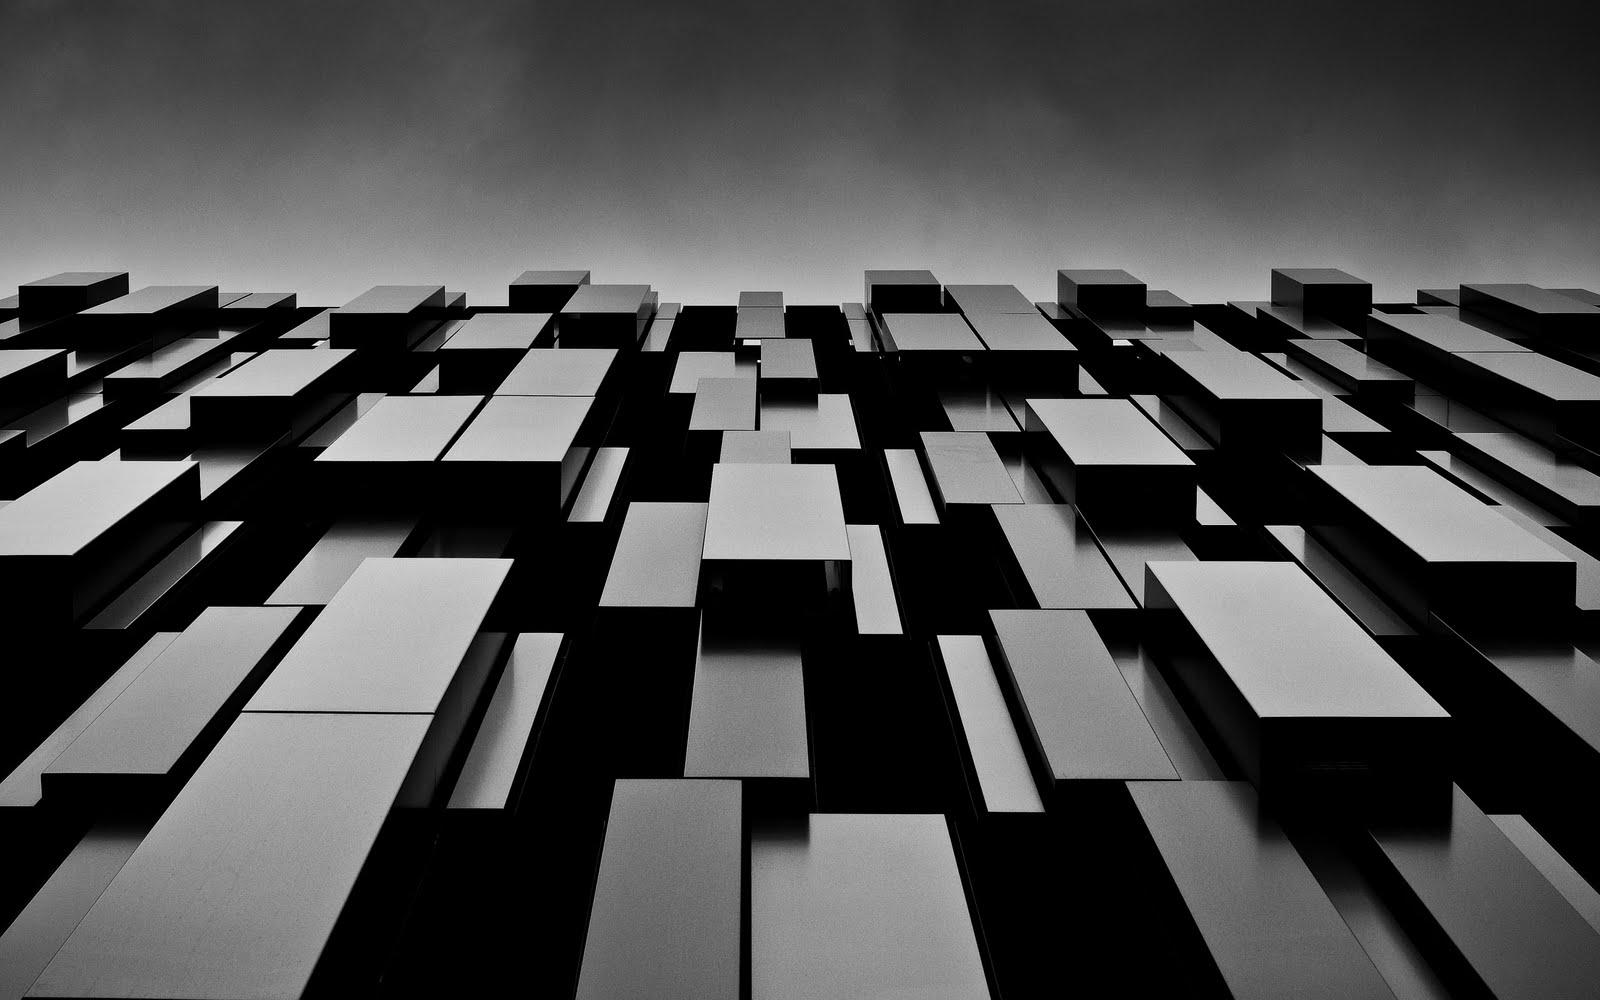 abstract geometric wallpapers hd wallpapersafari. Black Bedroom Furniture Sets. Home Design Ideas